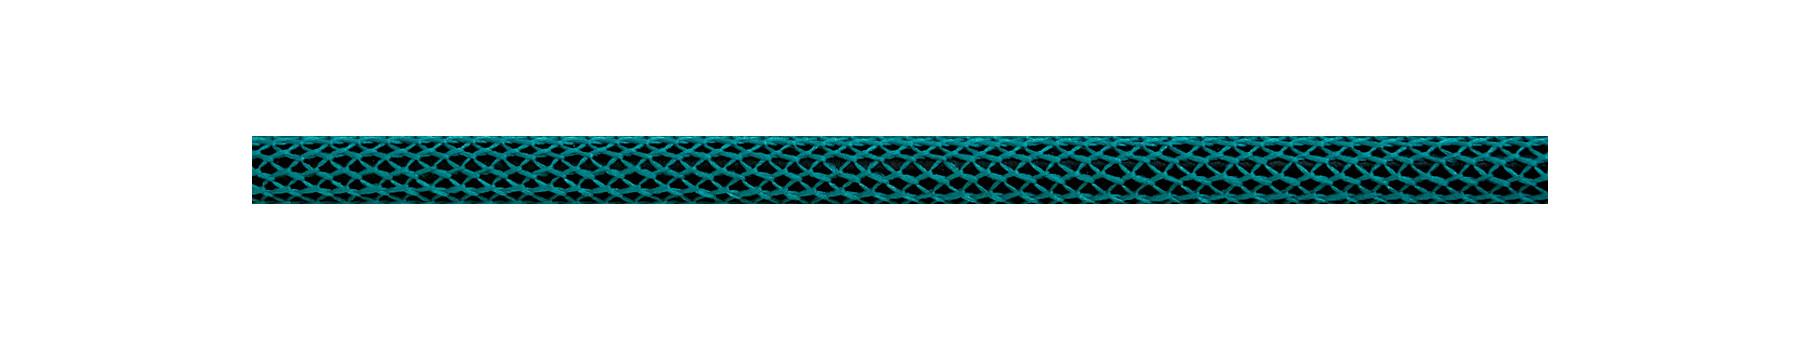 Textilkabel Türkis-Schwarz Netzartiger Textilmantel